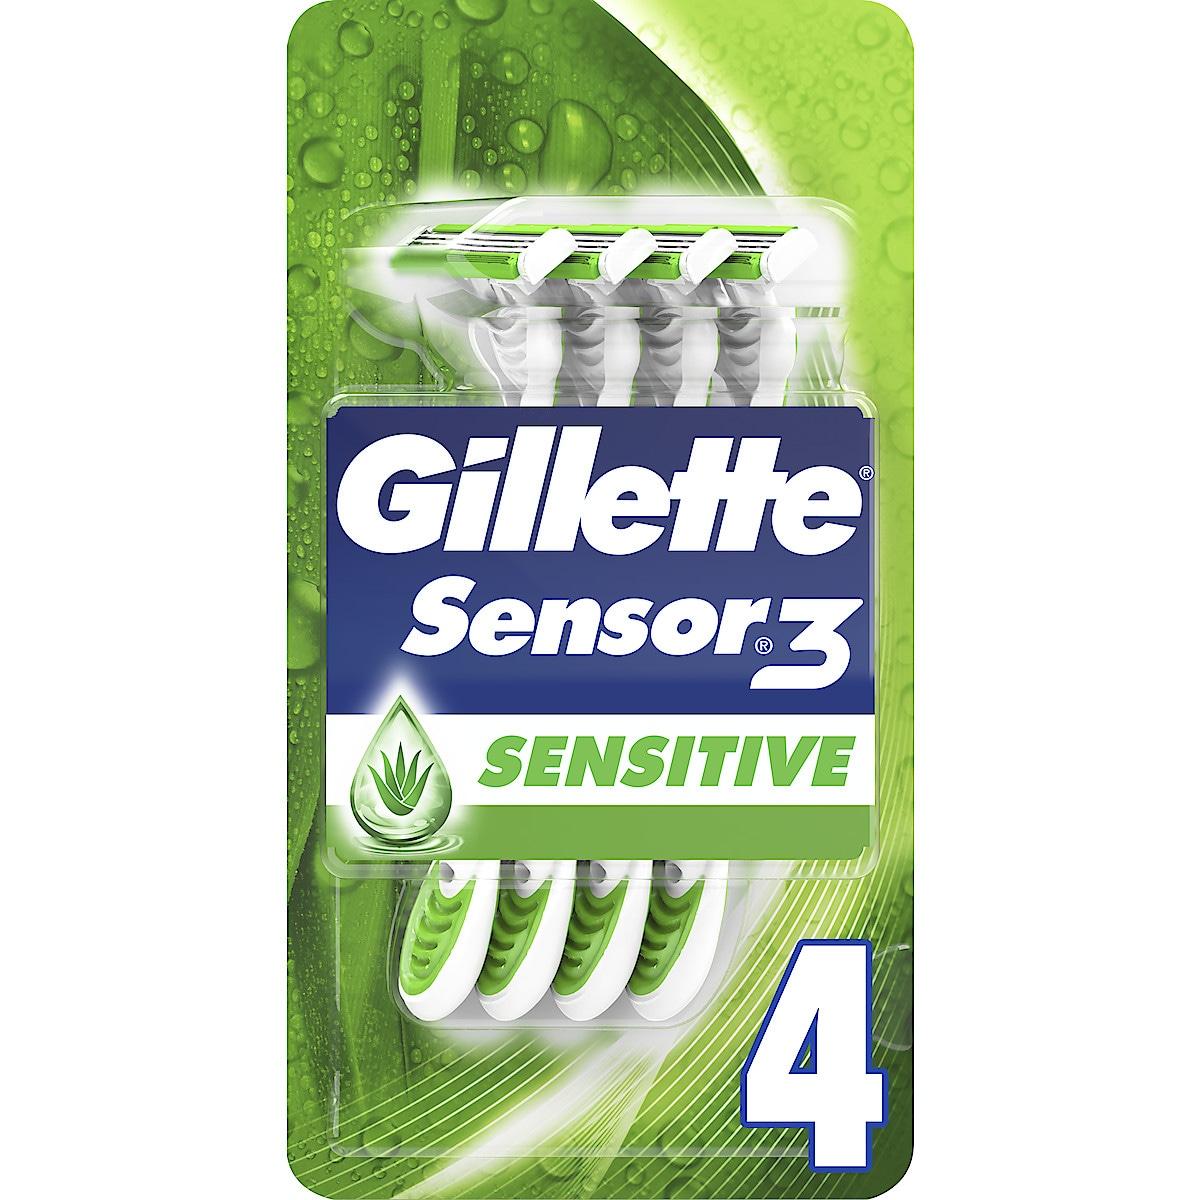 Rakhyvlar Gillette Sensor 3 Sensitive 4-pack